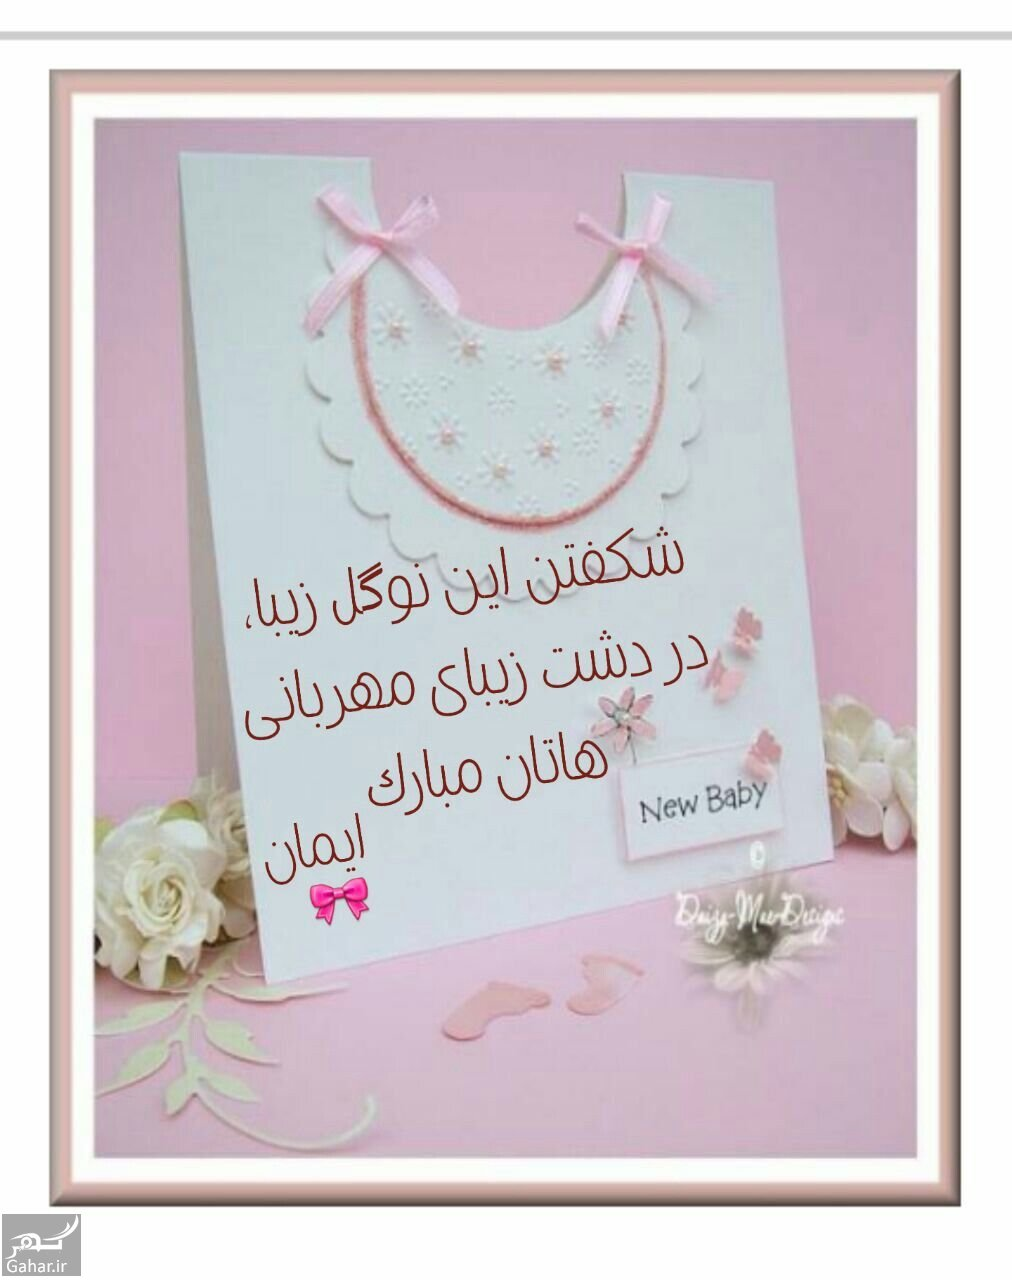 mataleb www.gahar .ir 22.10.97 8 پیامک و متن قدم نورسیده مبارک